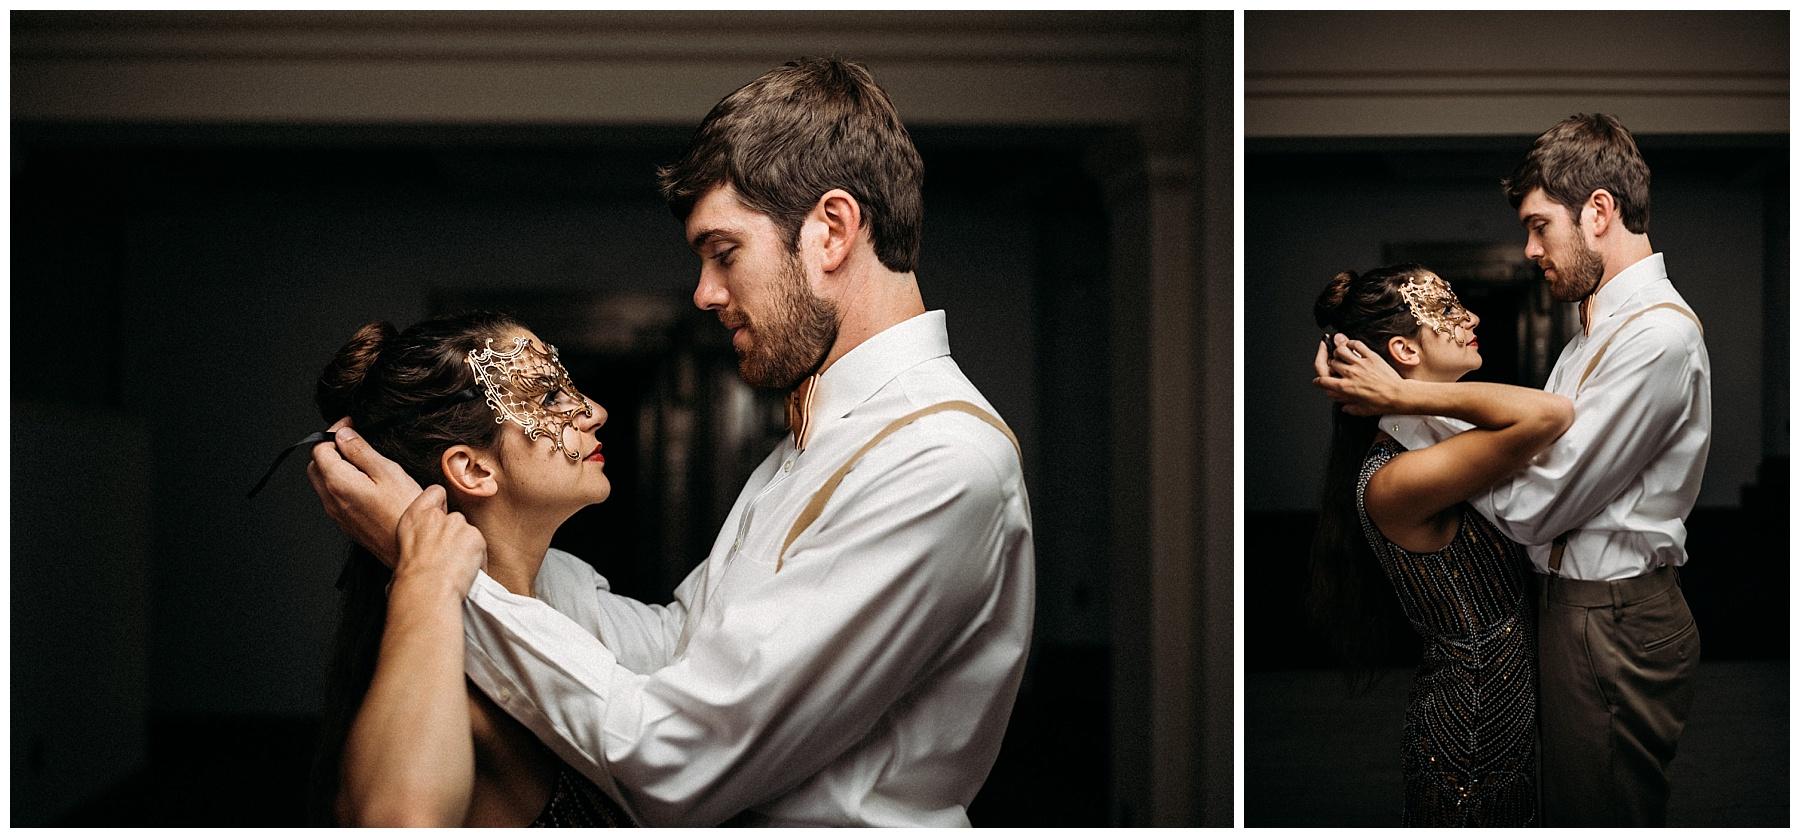 gatsby-styled-couples-shoot-final-g-web-20190707-0049_CCS-1.jpg